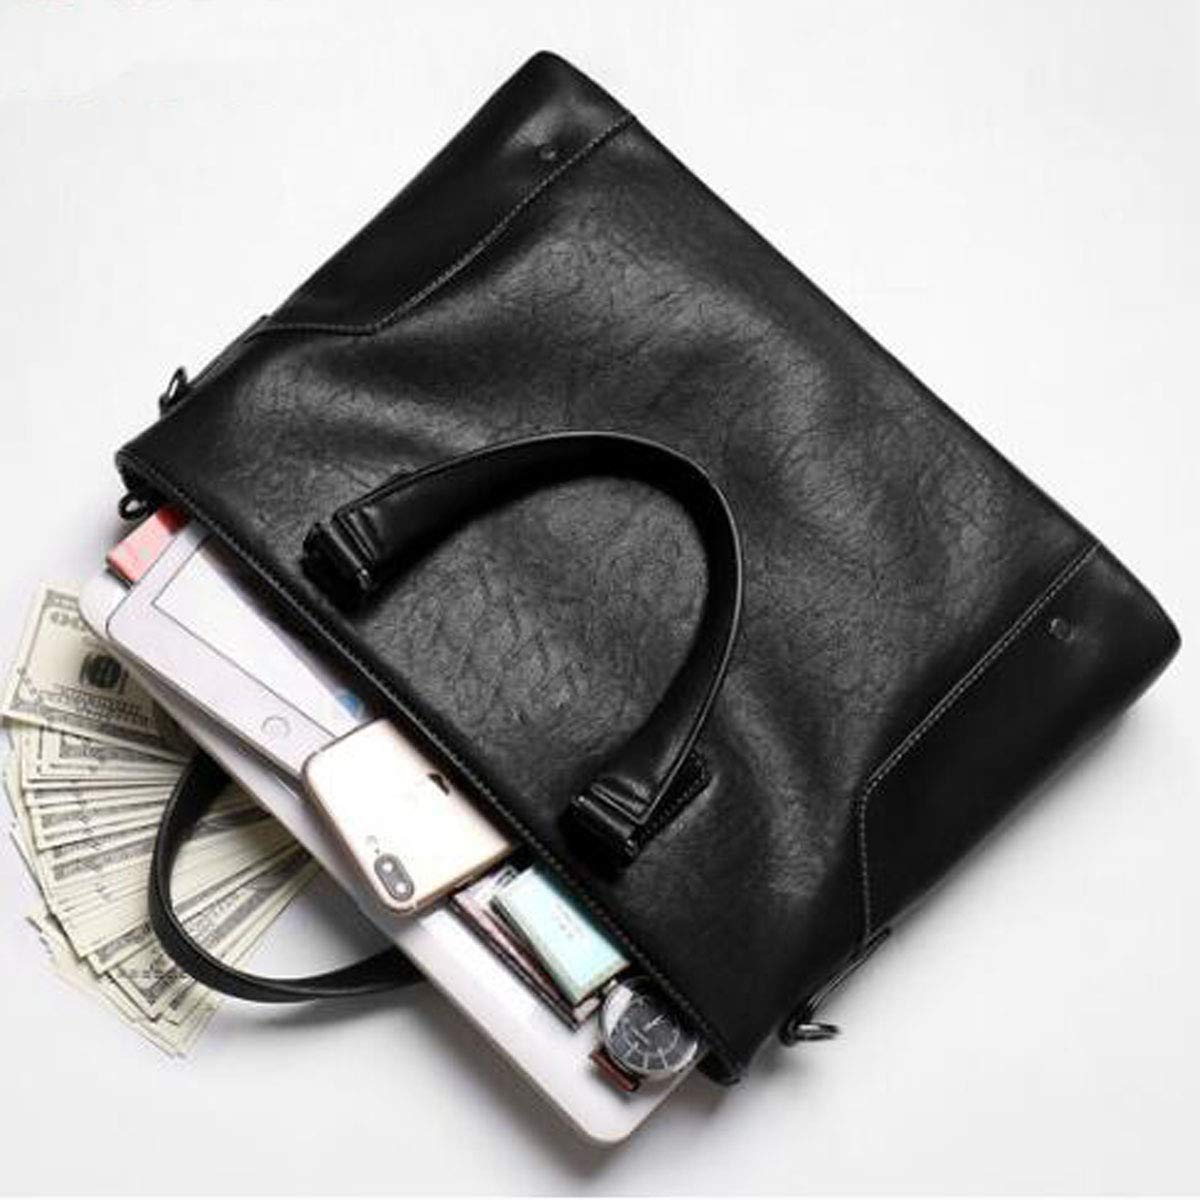 Hongyuantongxun Briefcase Color : Black Mens Business Casual Large-Capacity Handbag Black Size: 387.527cm Rest Assured